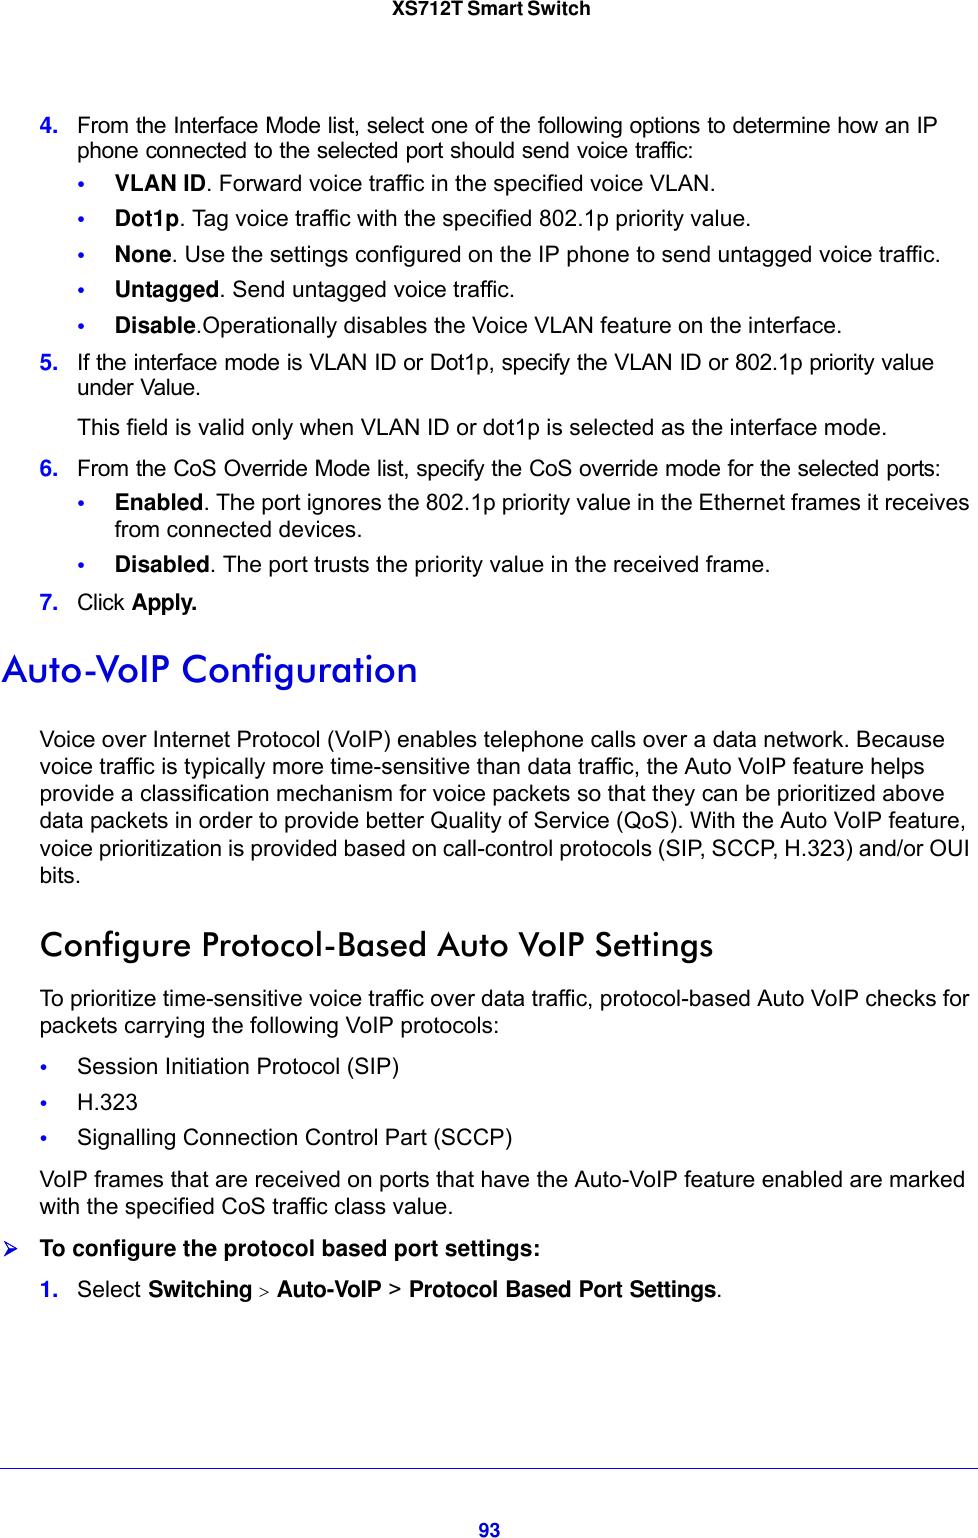 Netgear Xs712T Smart Switch 100Nes Users Manual X712T